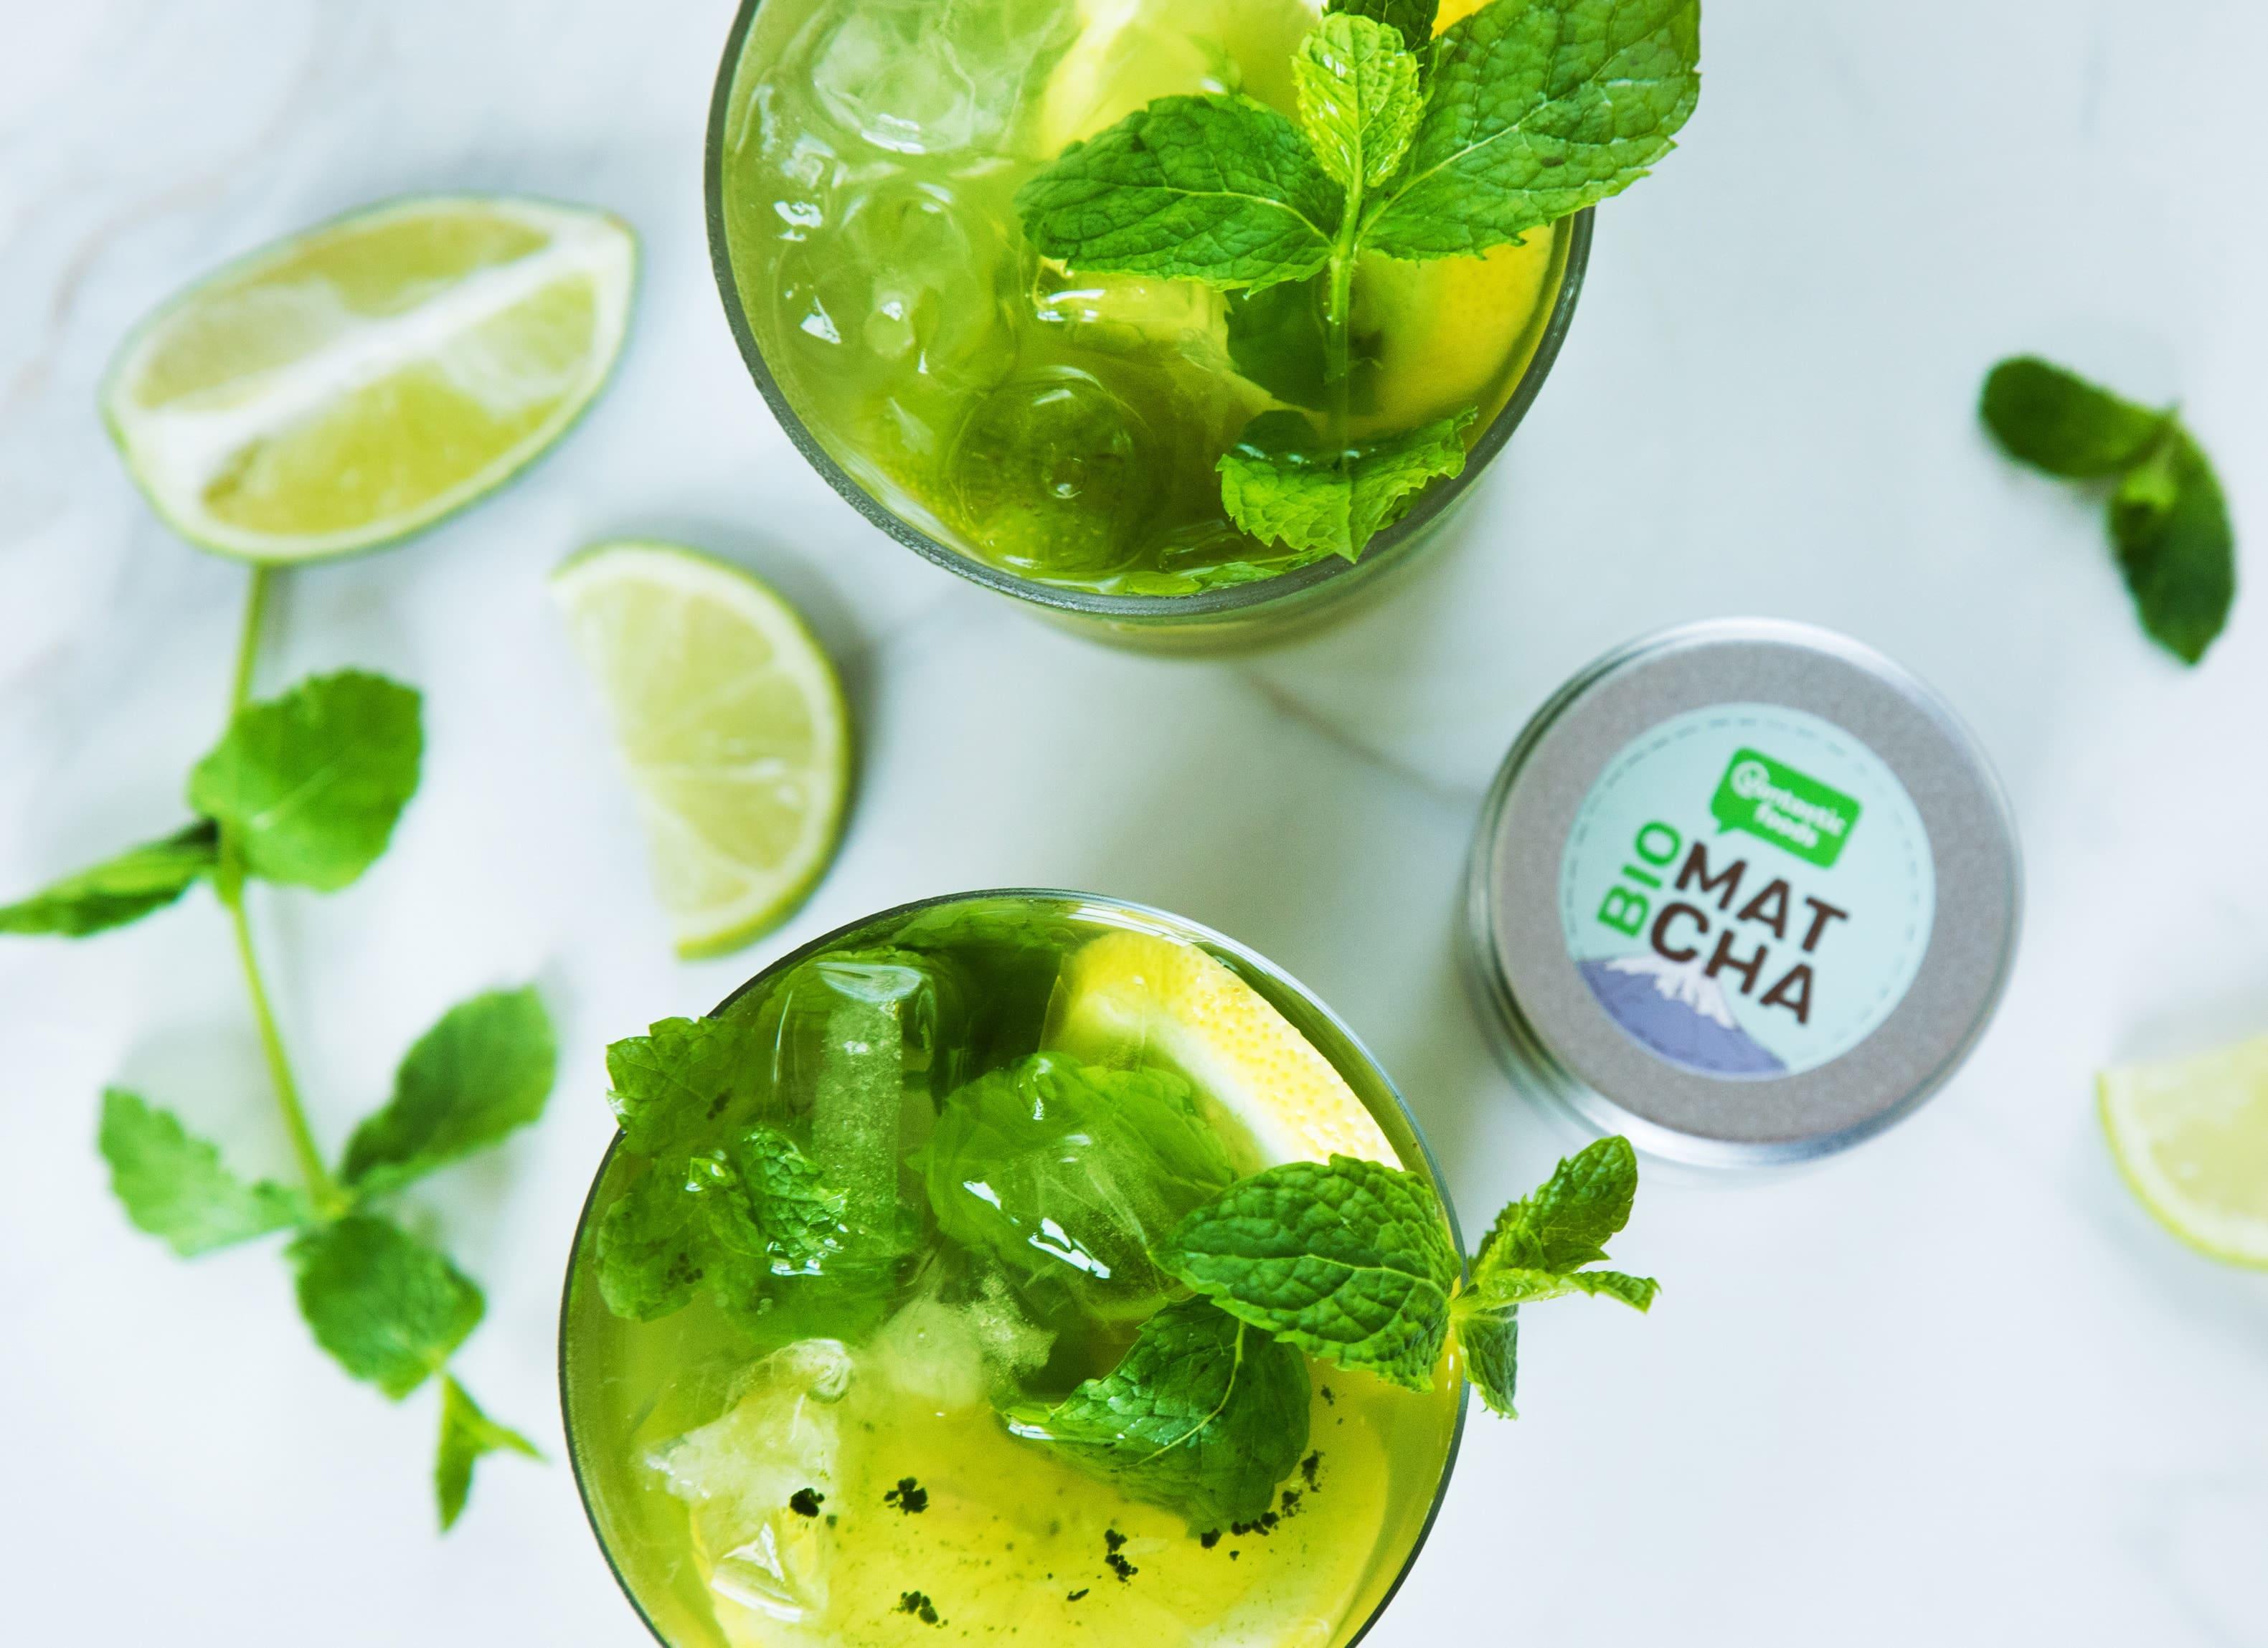 Matcha-Zitronen-Limonade mit Minze & Limetten